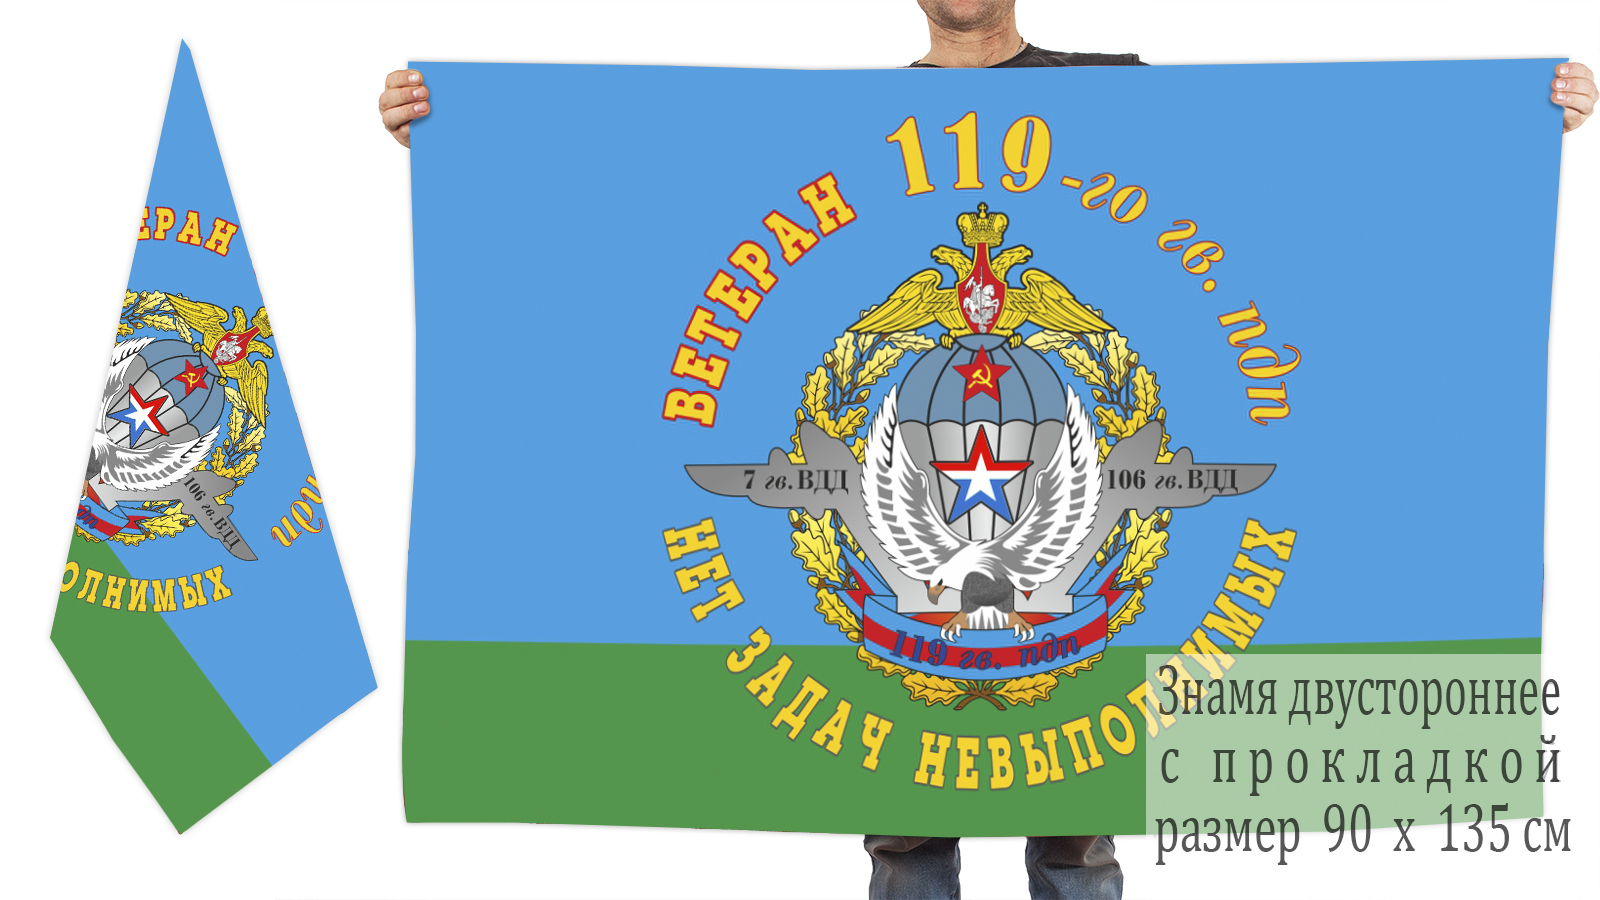 Двусторонний флаг Ветеран 119-го Гв. ПДП заказать с доставкой